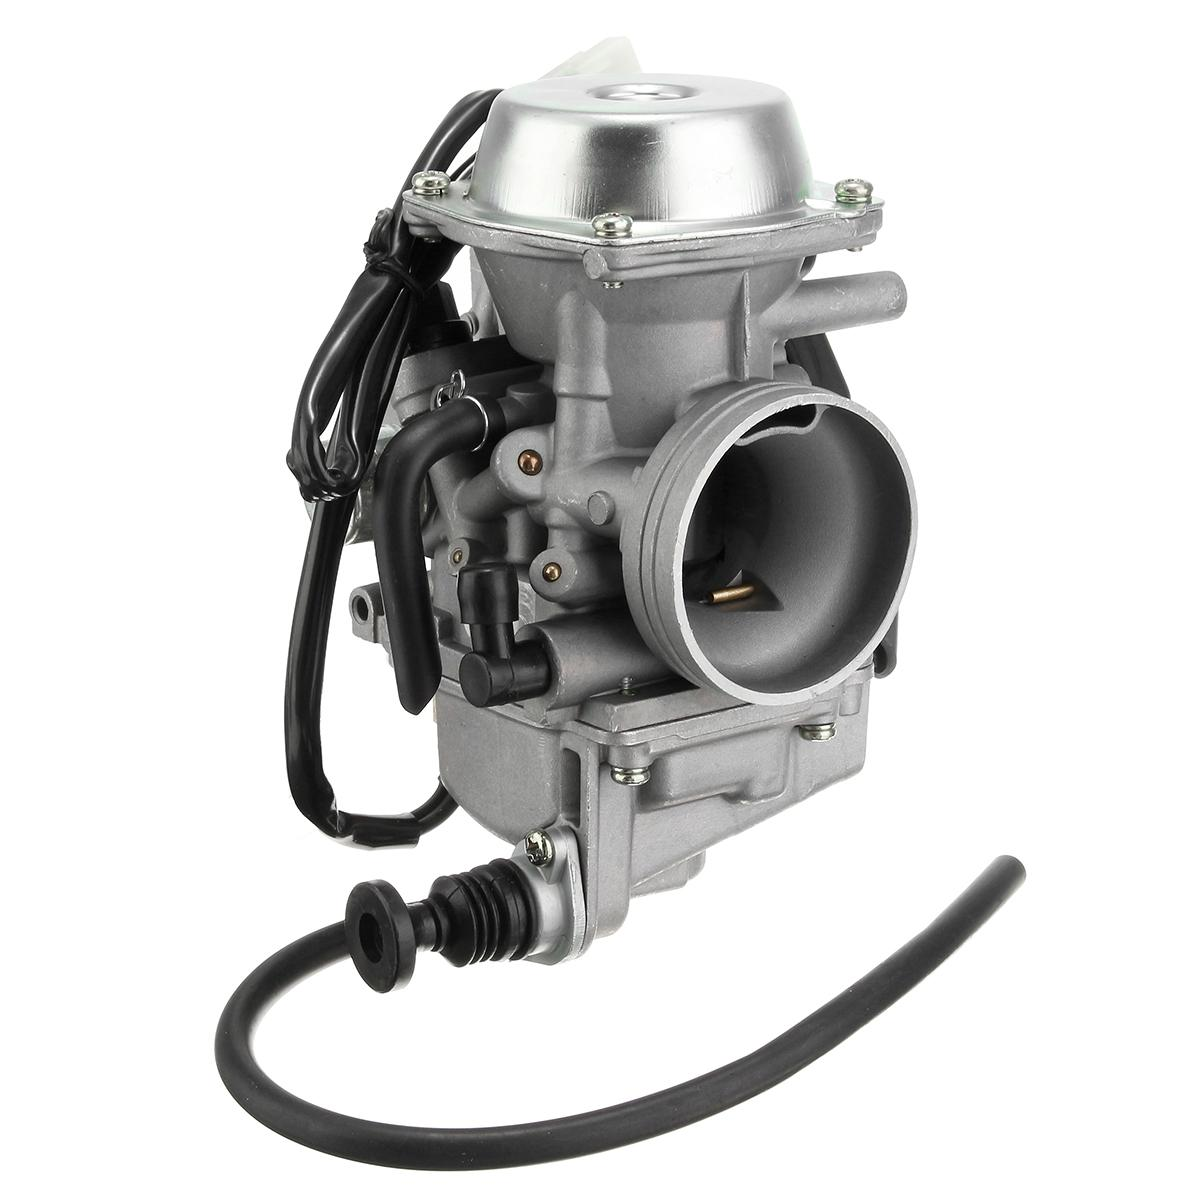 Carburetor Fits For Honda 400 TRX400FW Fourtrax Foreman 1995-2003 ATV New CarbCarburetor Fits For Honda 400 TRX400FW Fourtrax Foreman 1995-2003 ATV New Carb